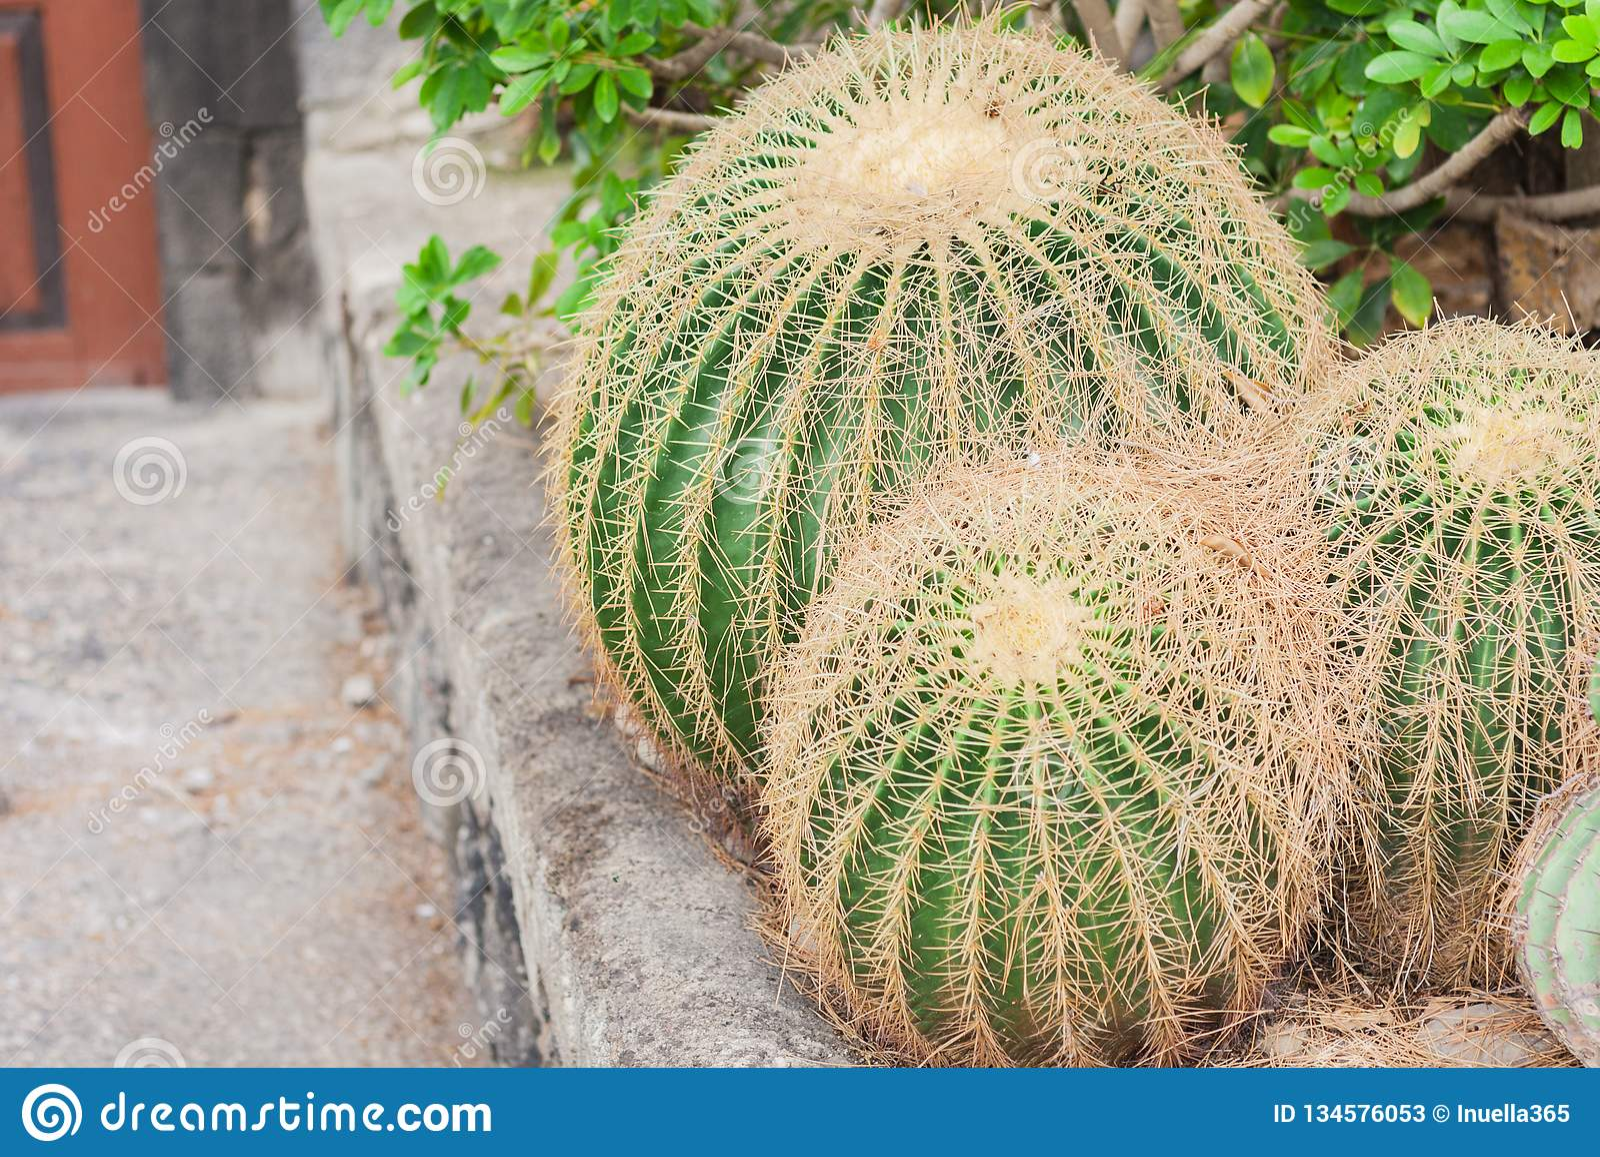 Echinocactus Grusonii Cactus, also known as Golden Barrel in the garden of Acicastello, Acitrezza, Catania, Sicily